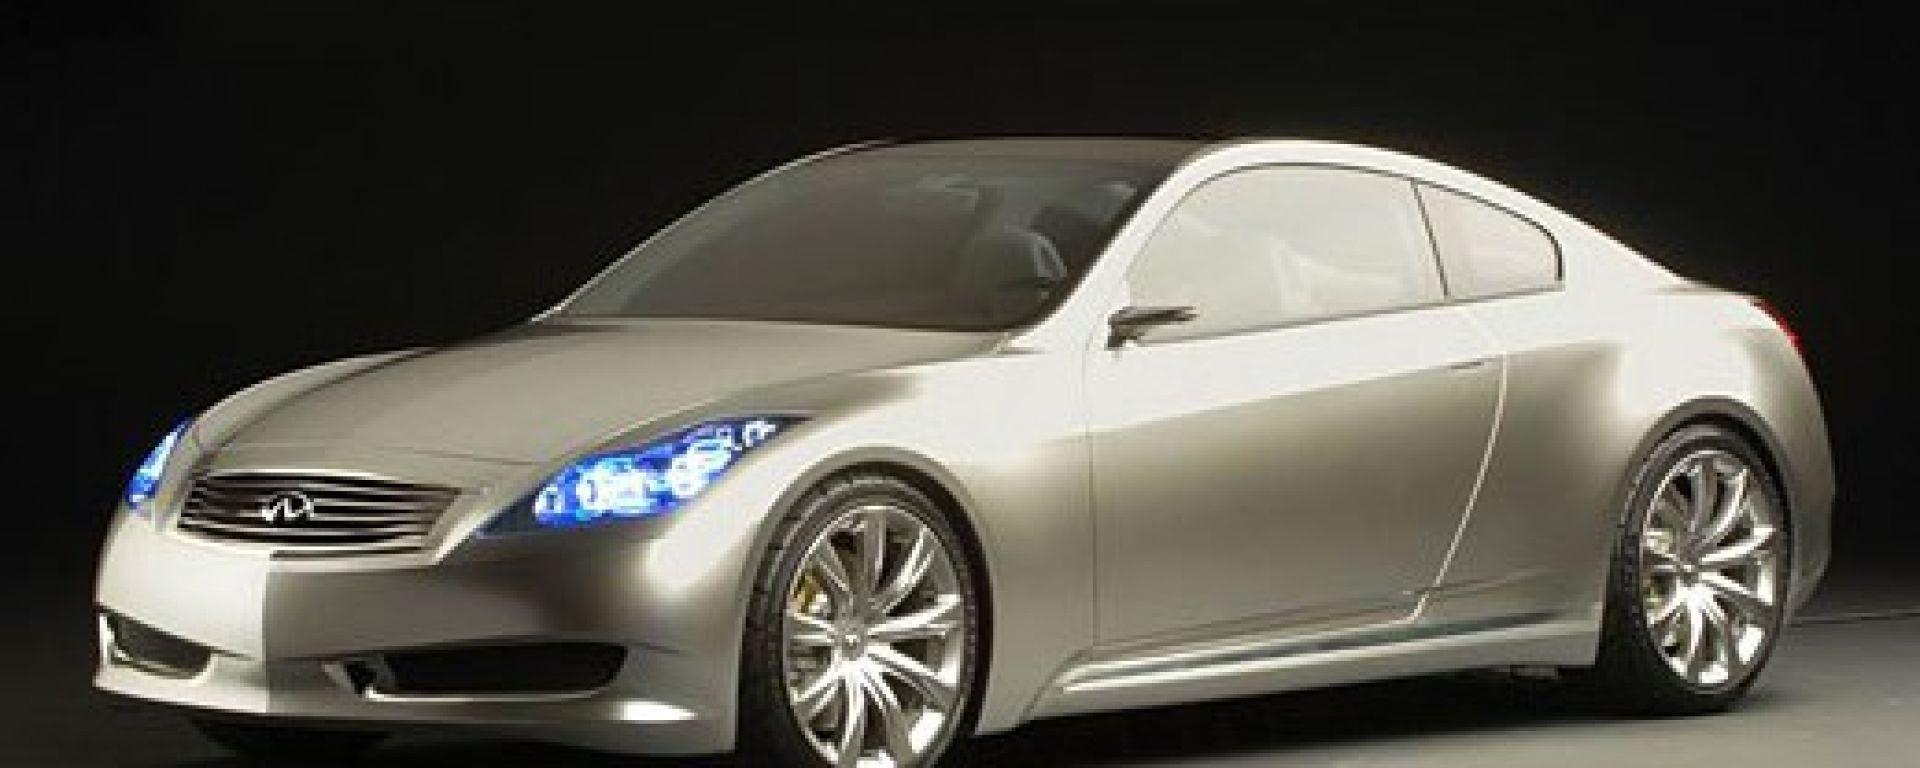 Infiniti Coupe Concept